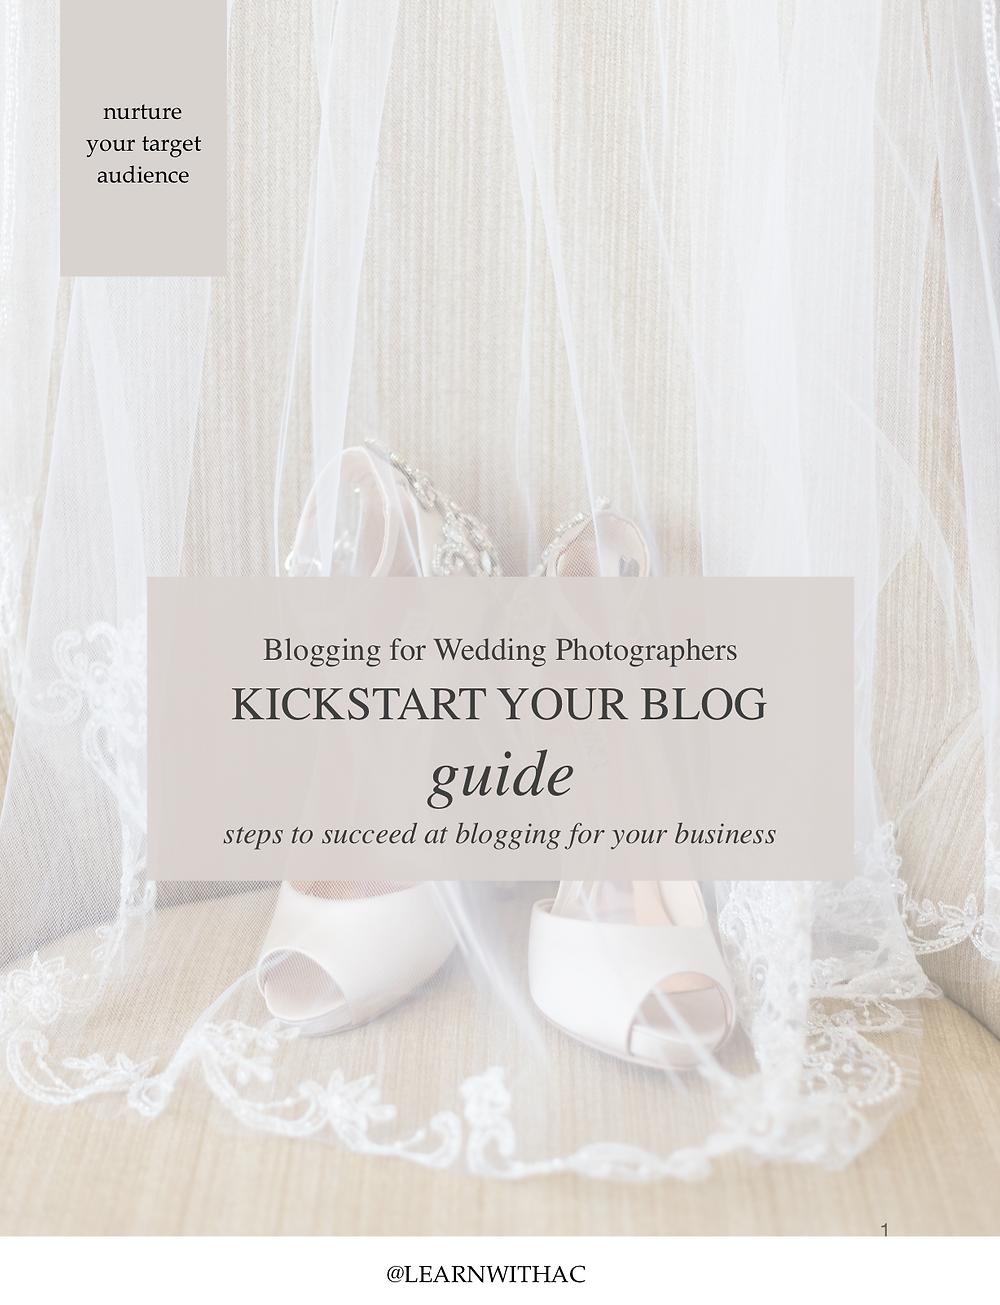 Kickstart your blog.